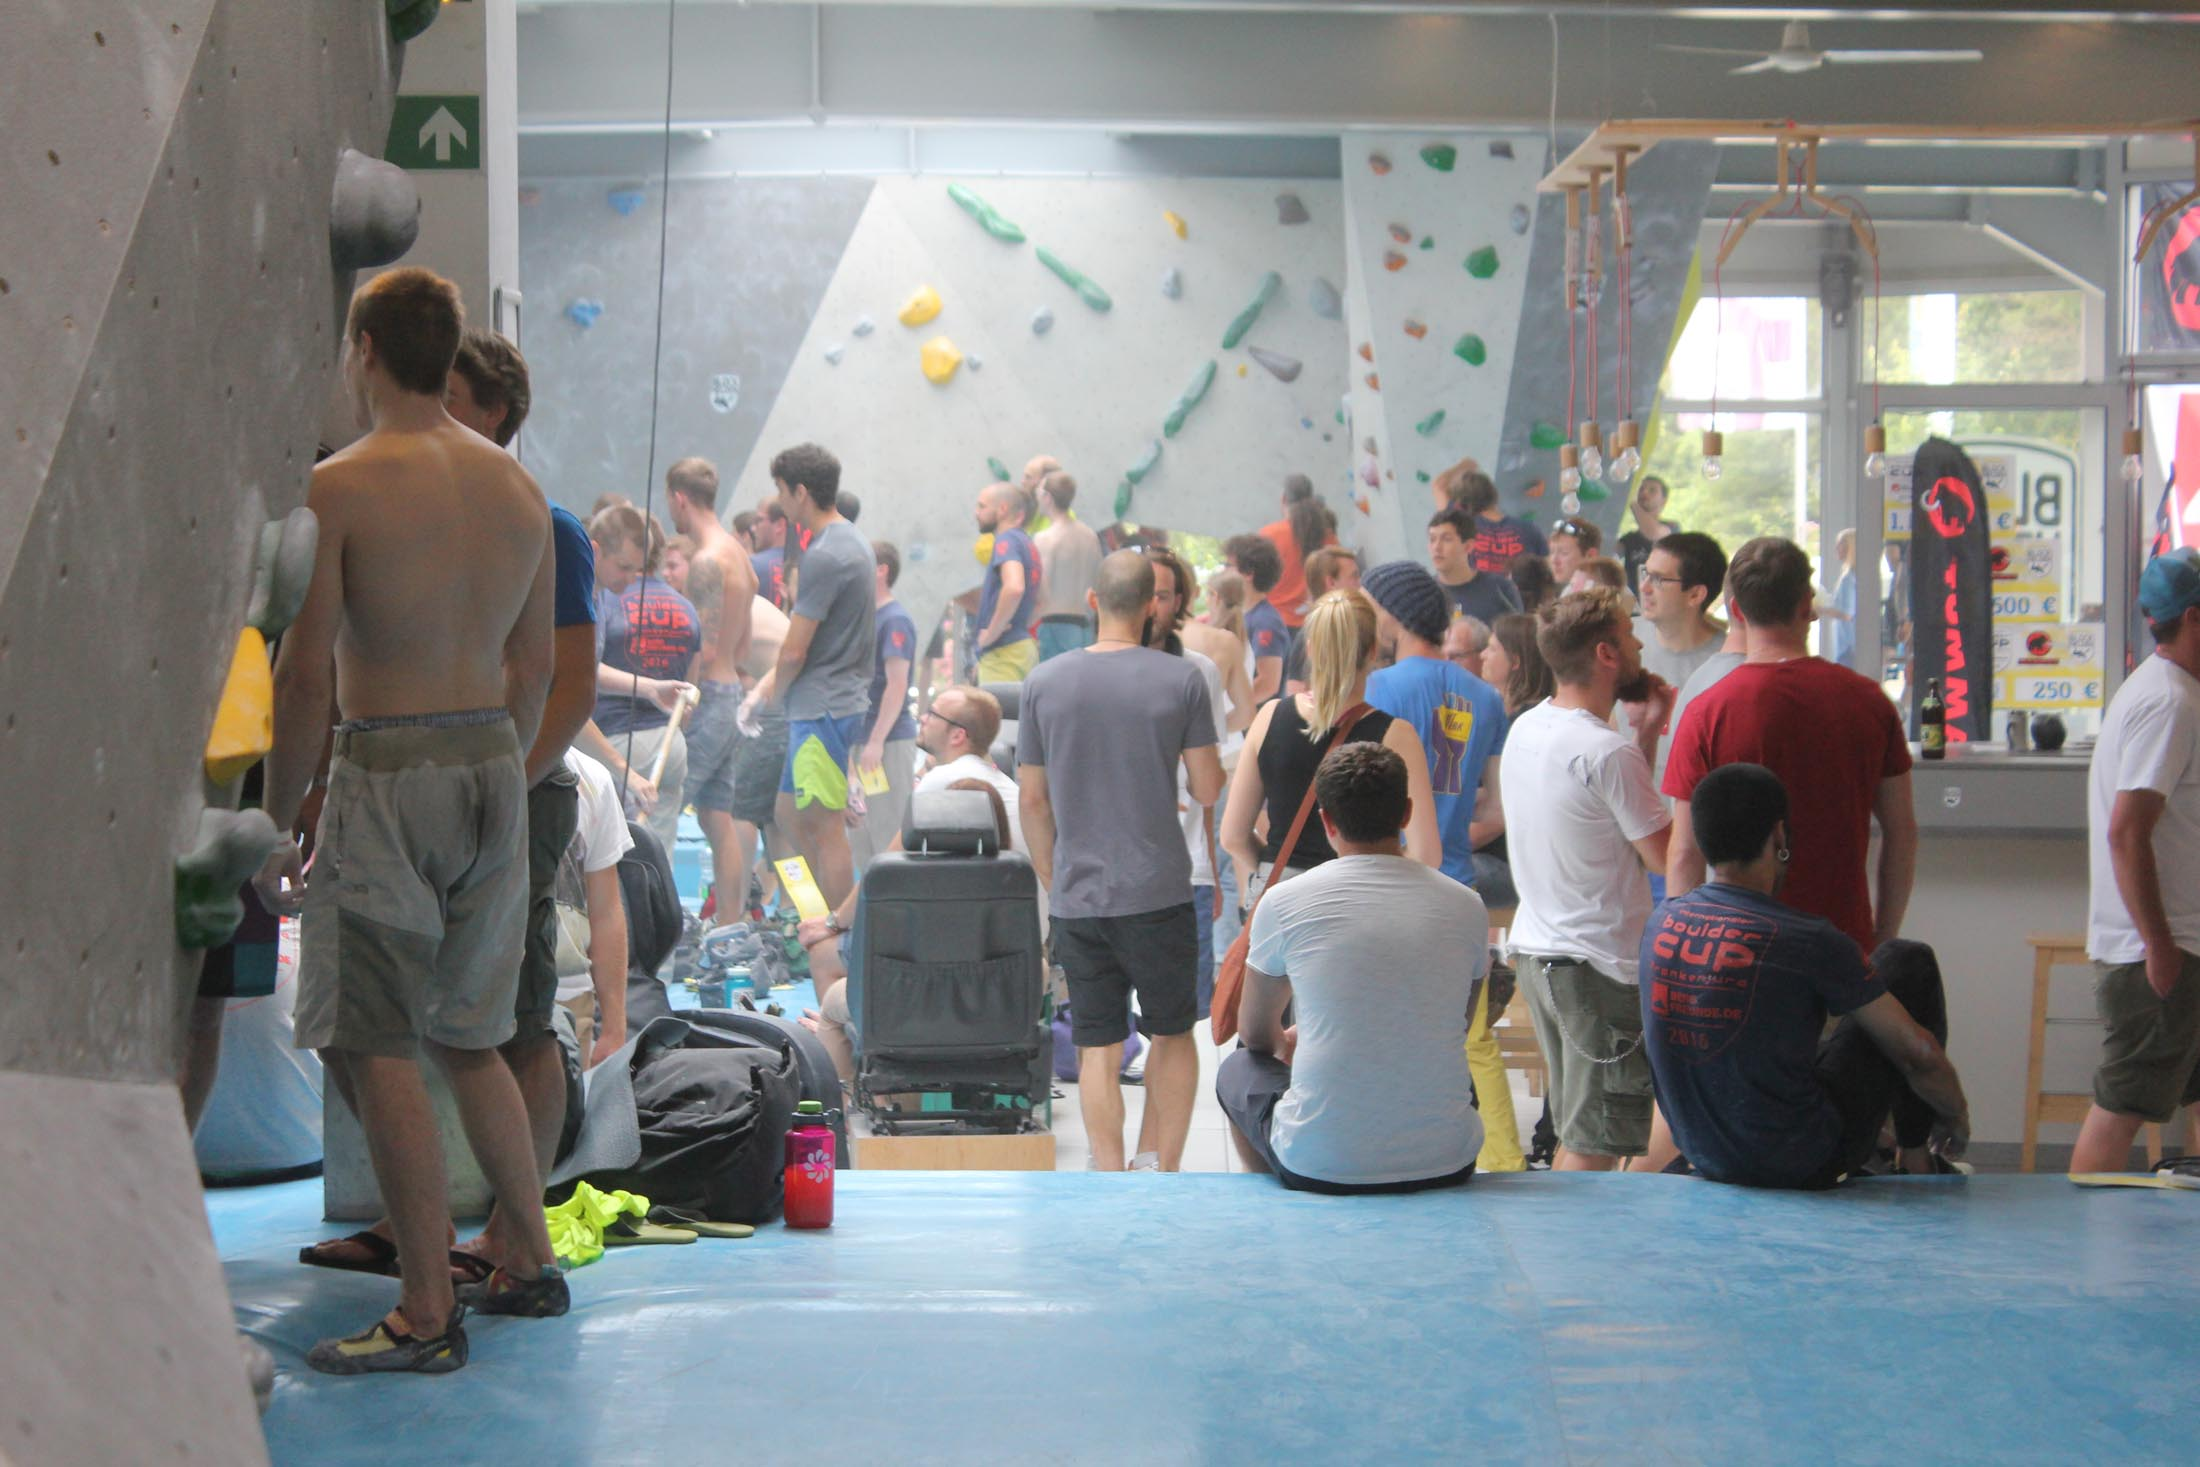 Quali, internationaler bouldercup Frankenjura 2016, BLOCKHELDEN Erlangen, Mammut, Bergfreunde.de, Boulderwettkampf07092016216